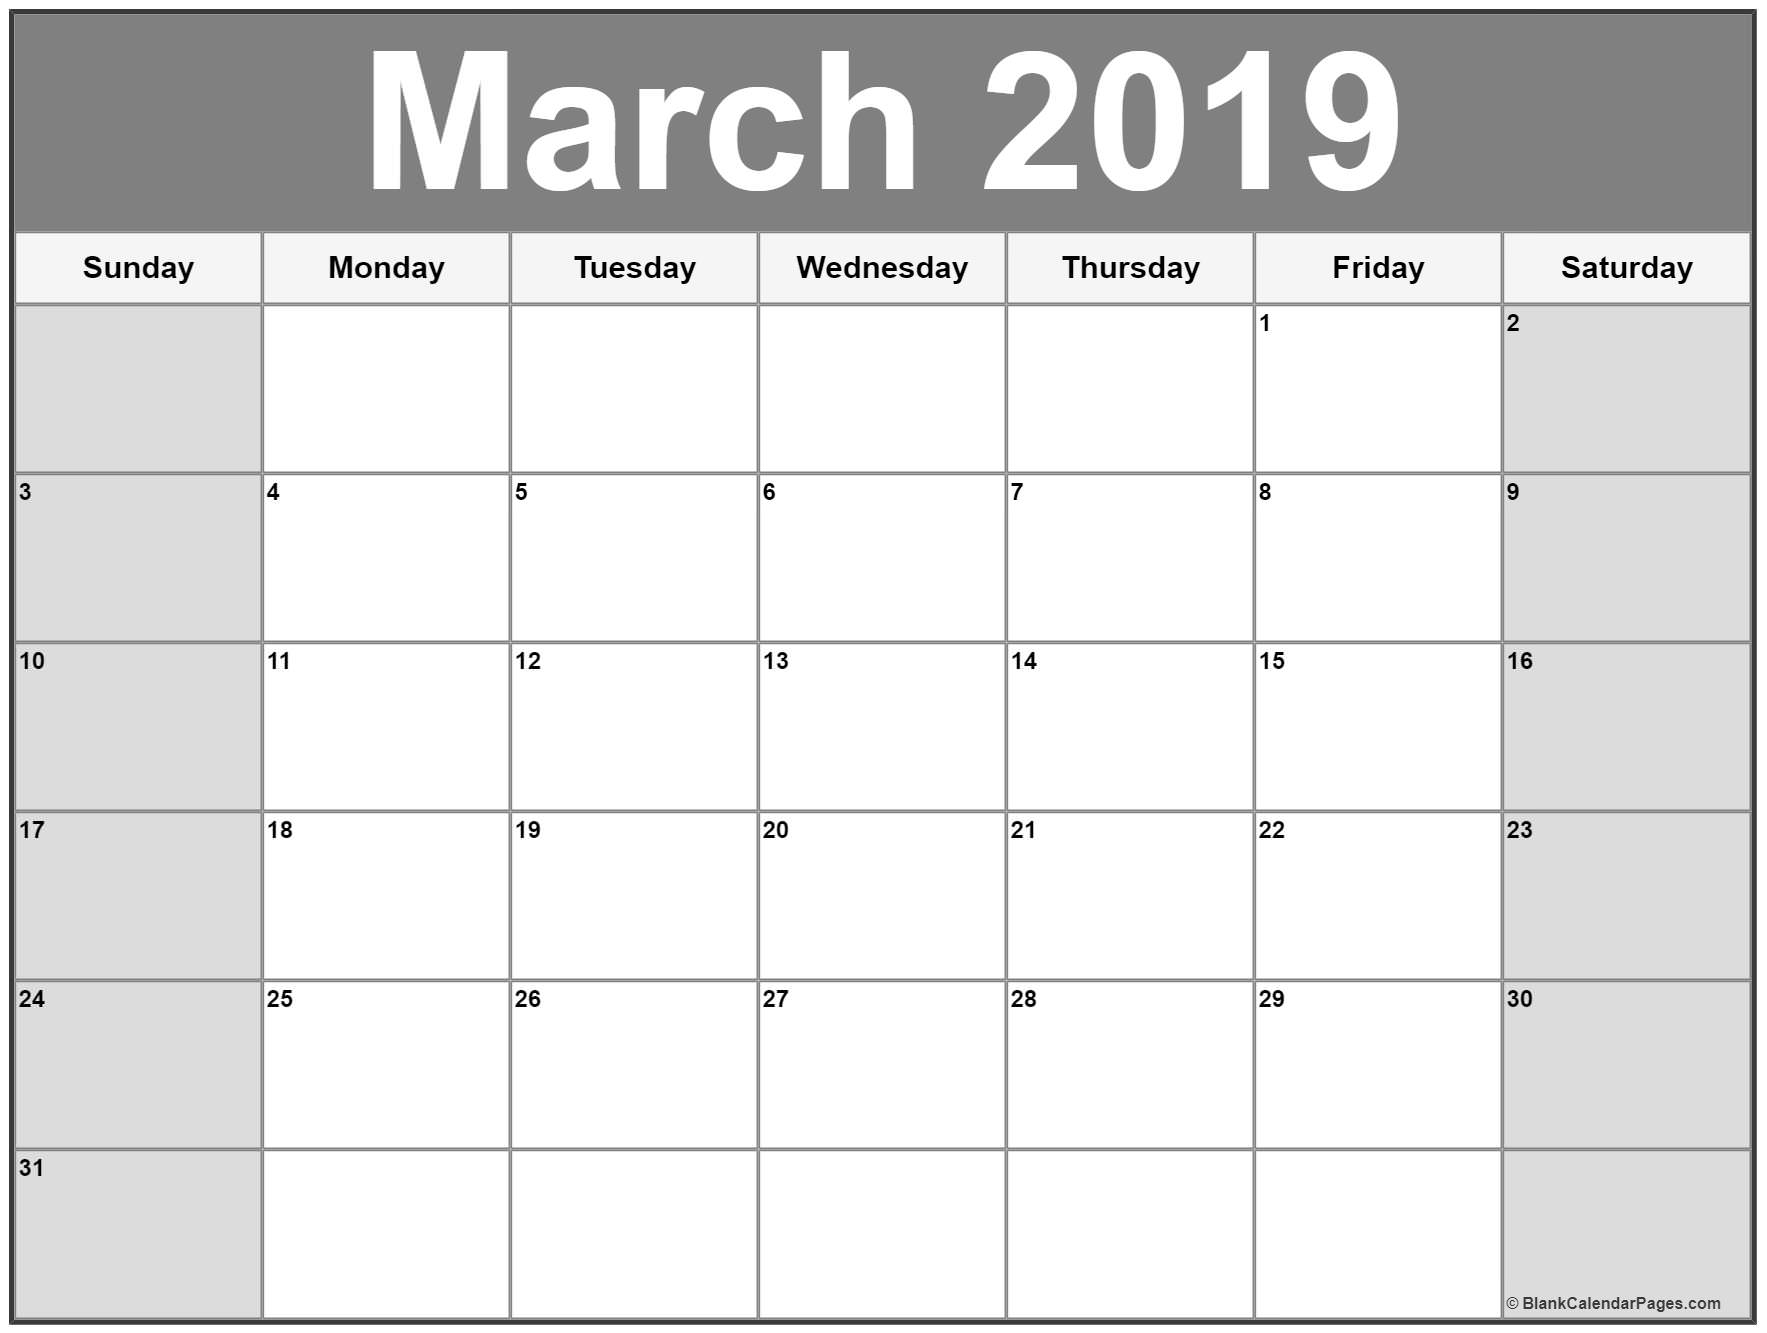 March 2019 Calendar | 51+ Calendar Templates Of 2019 Calendars